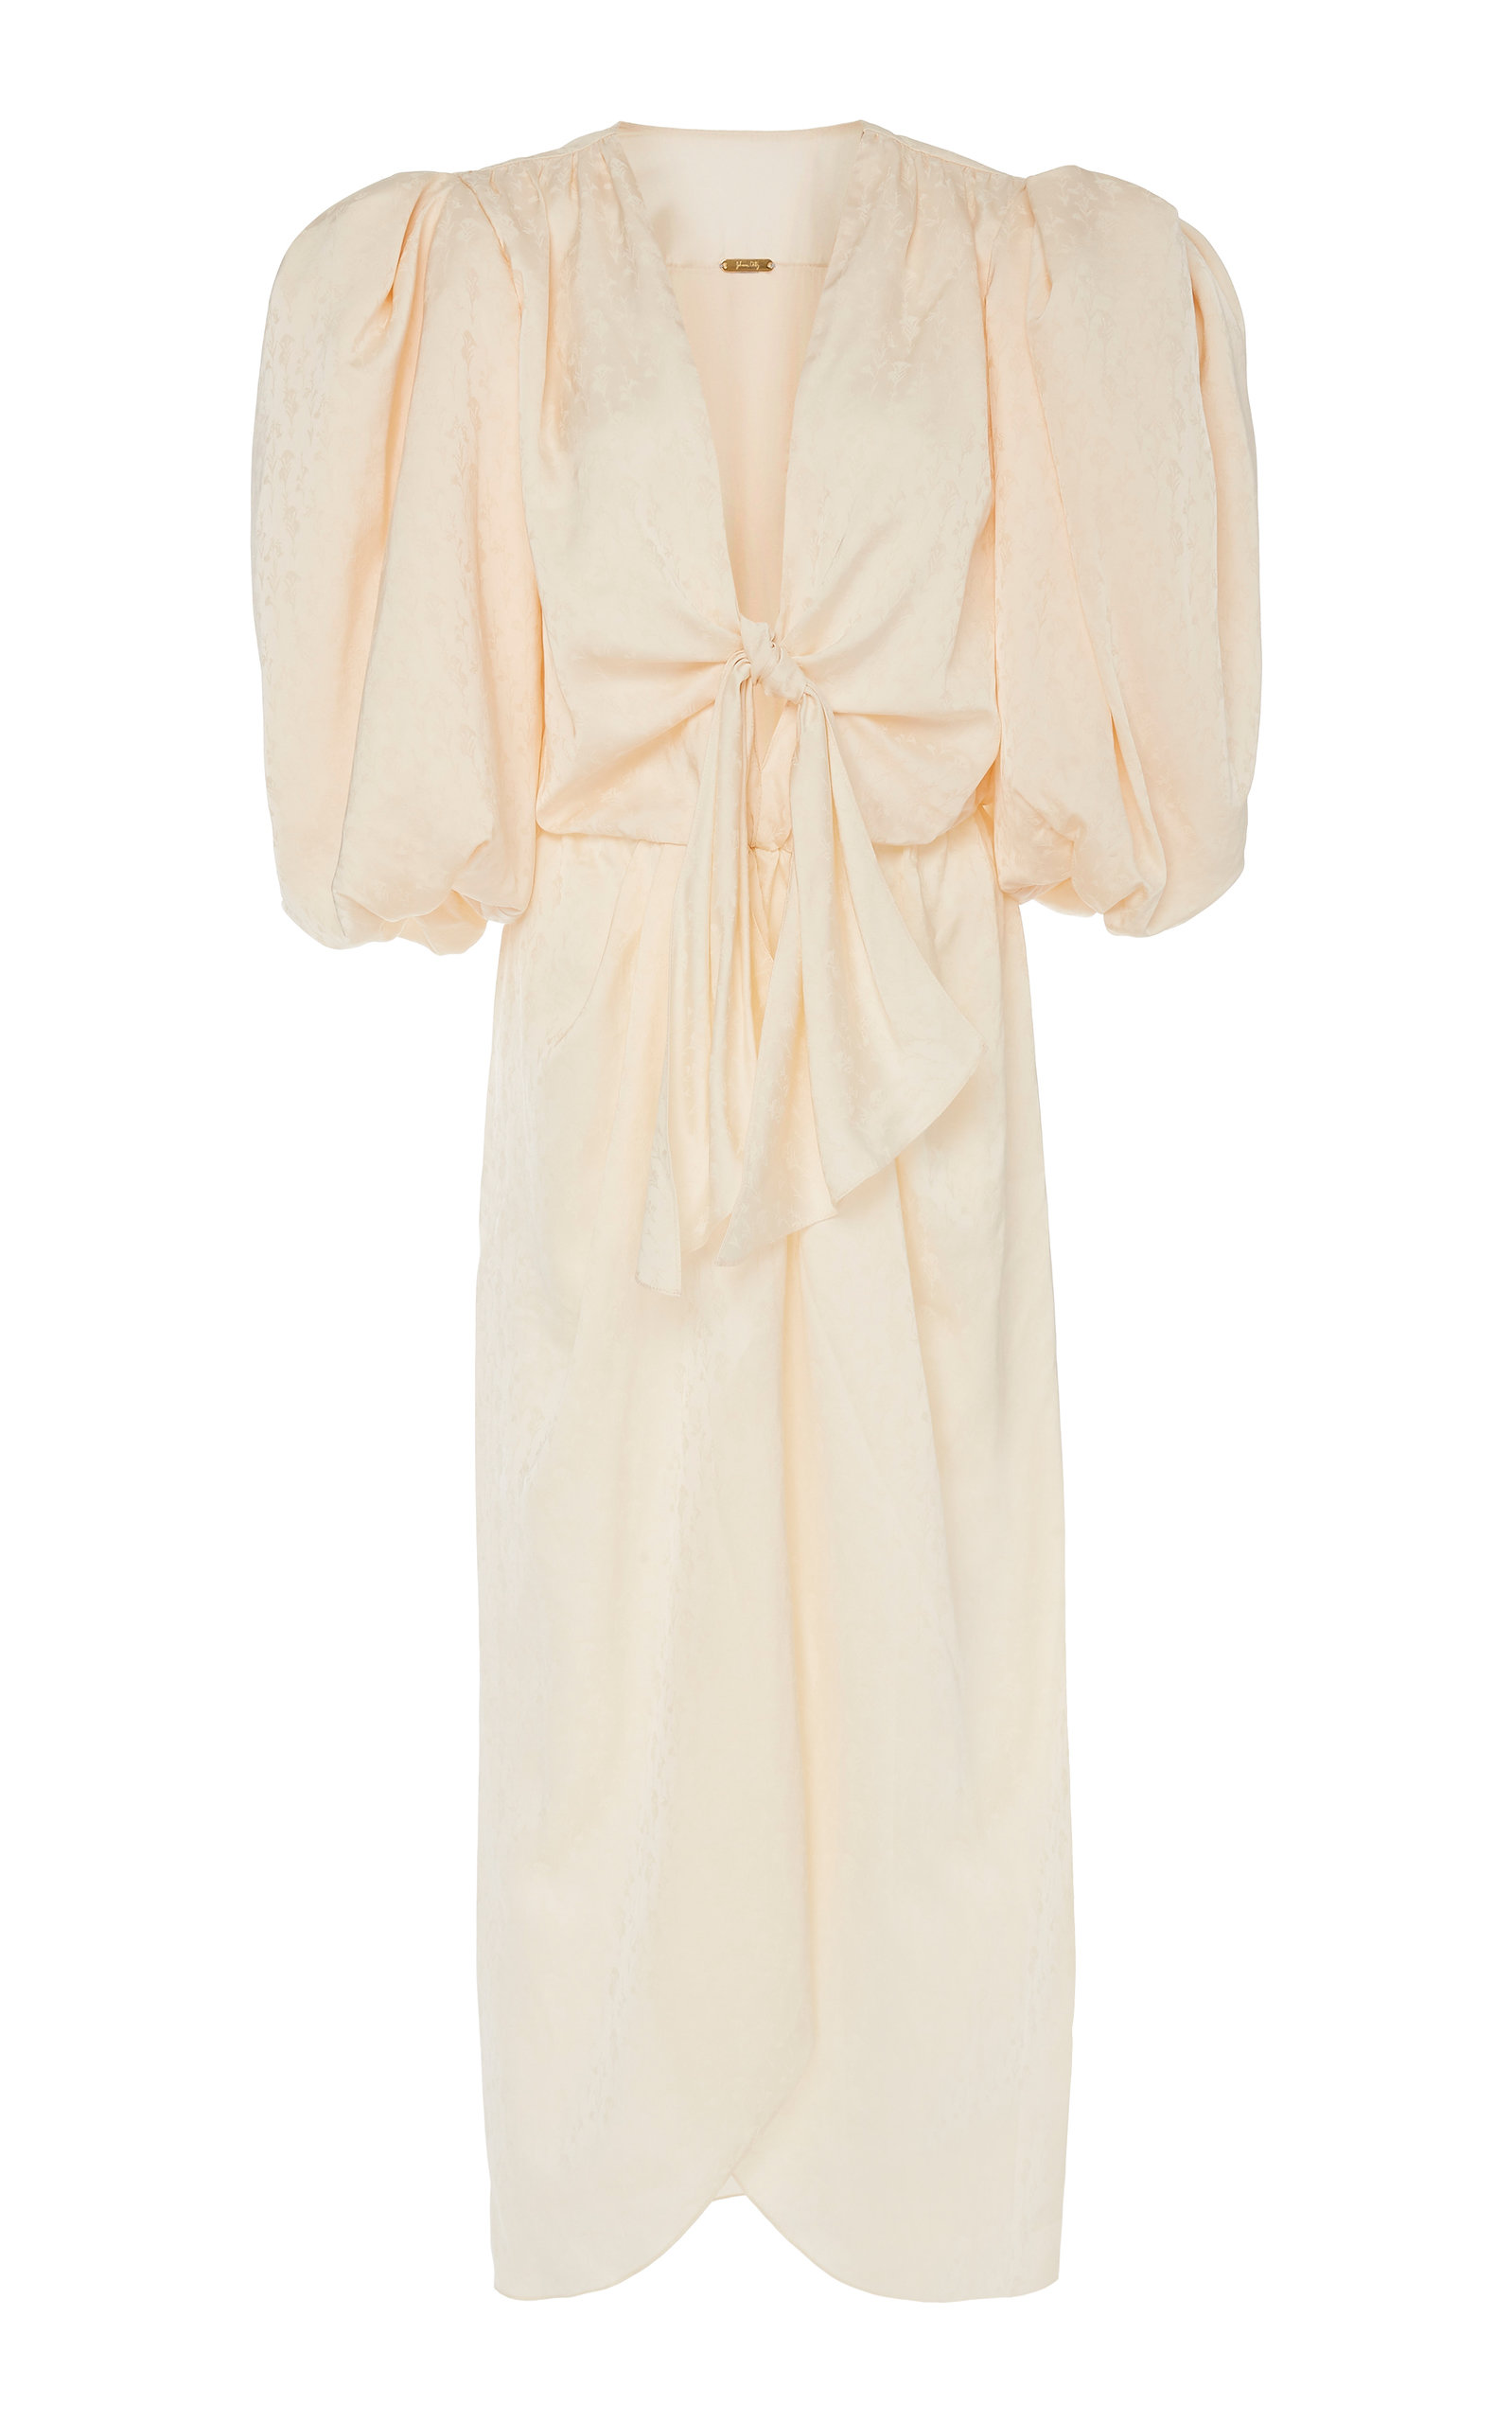 Buy Johanna Ortiz Bow-Detailed Satin-Jacquard Midi Dress online, shop Johanna Ortiz at the best price